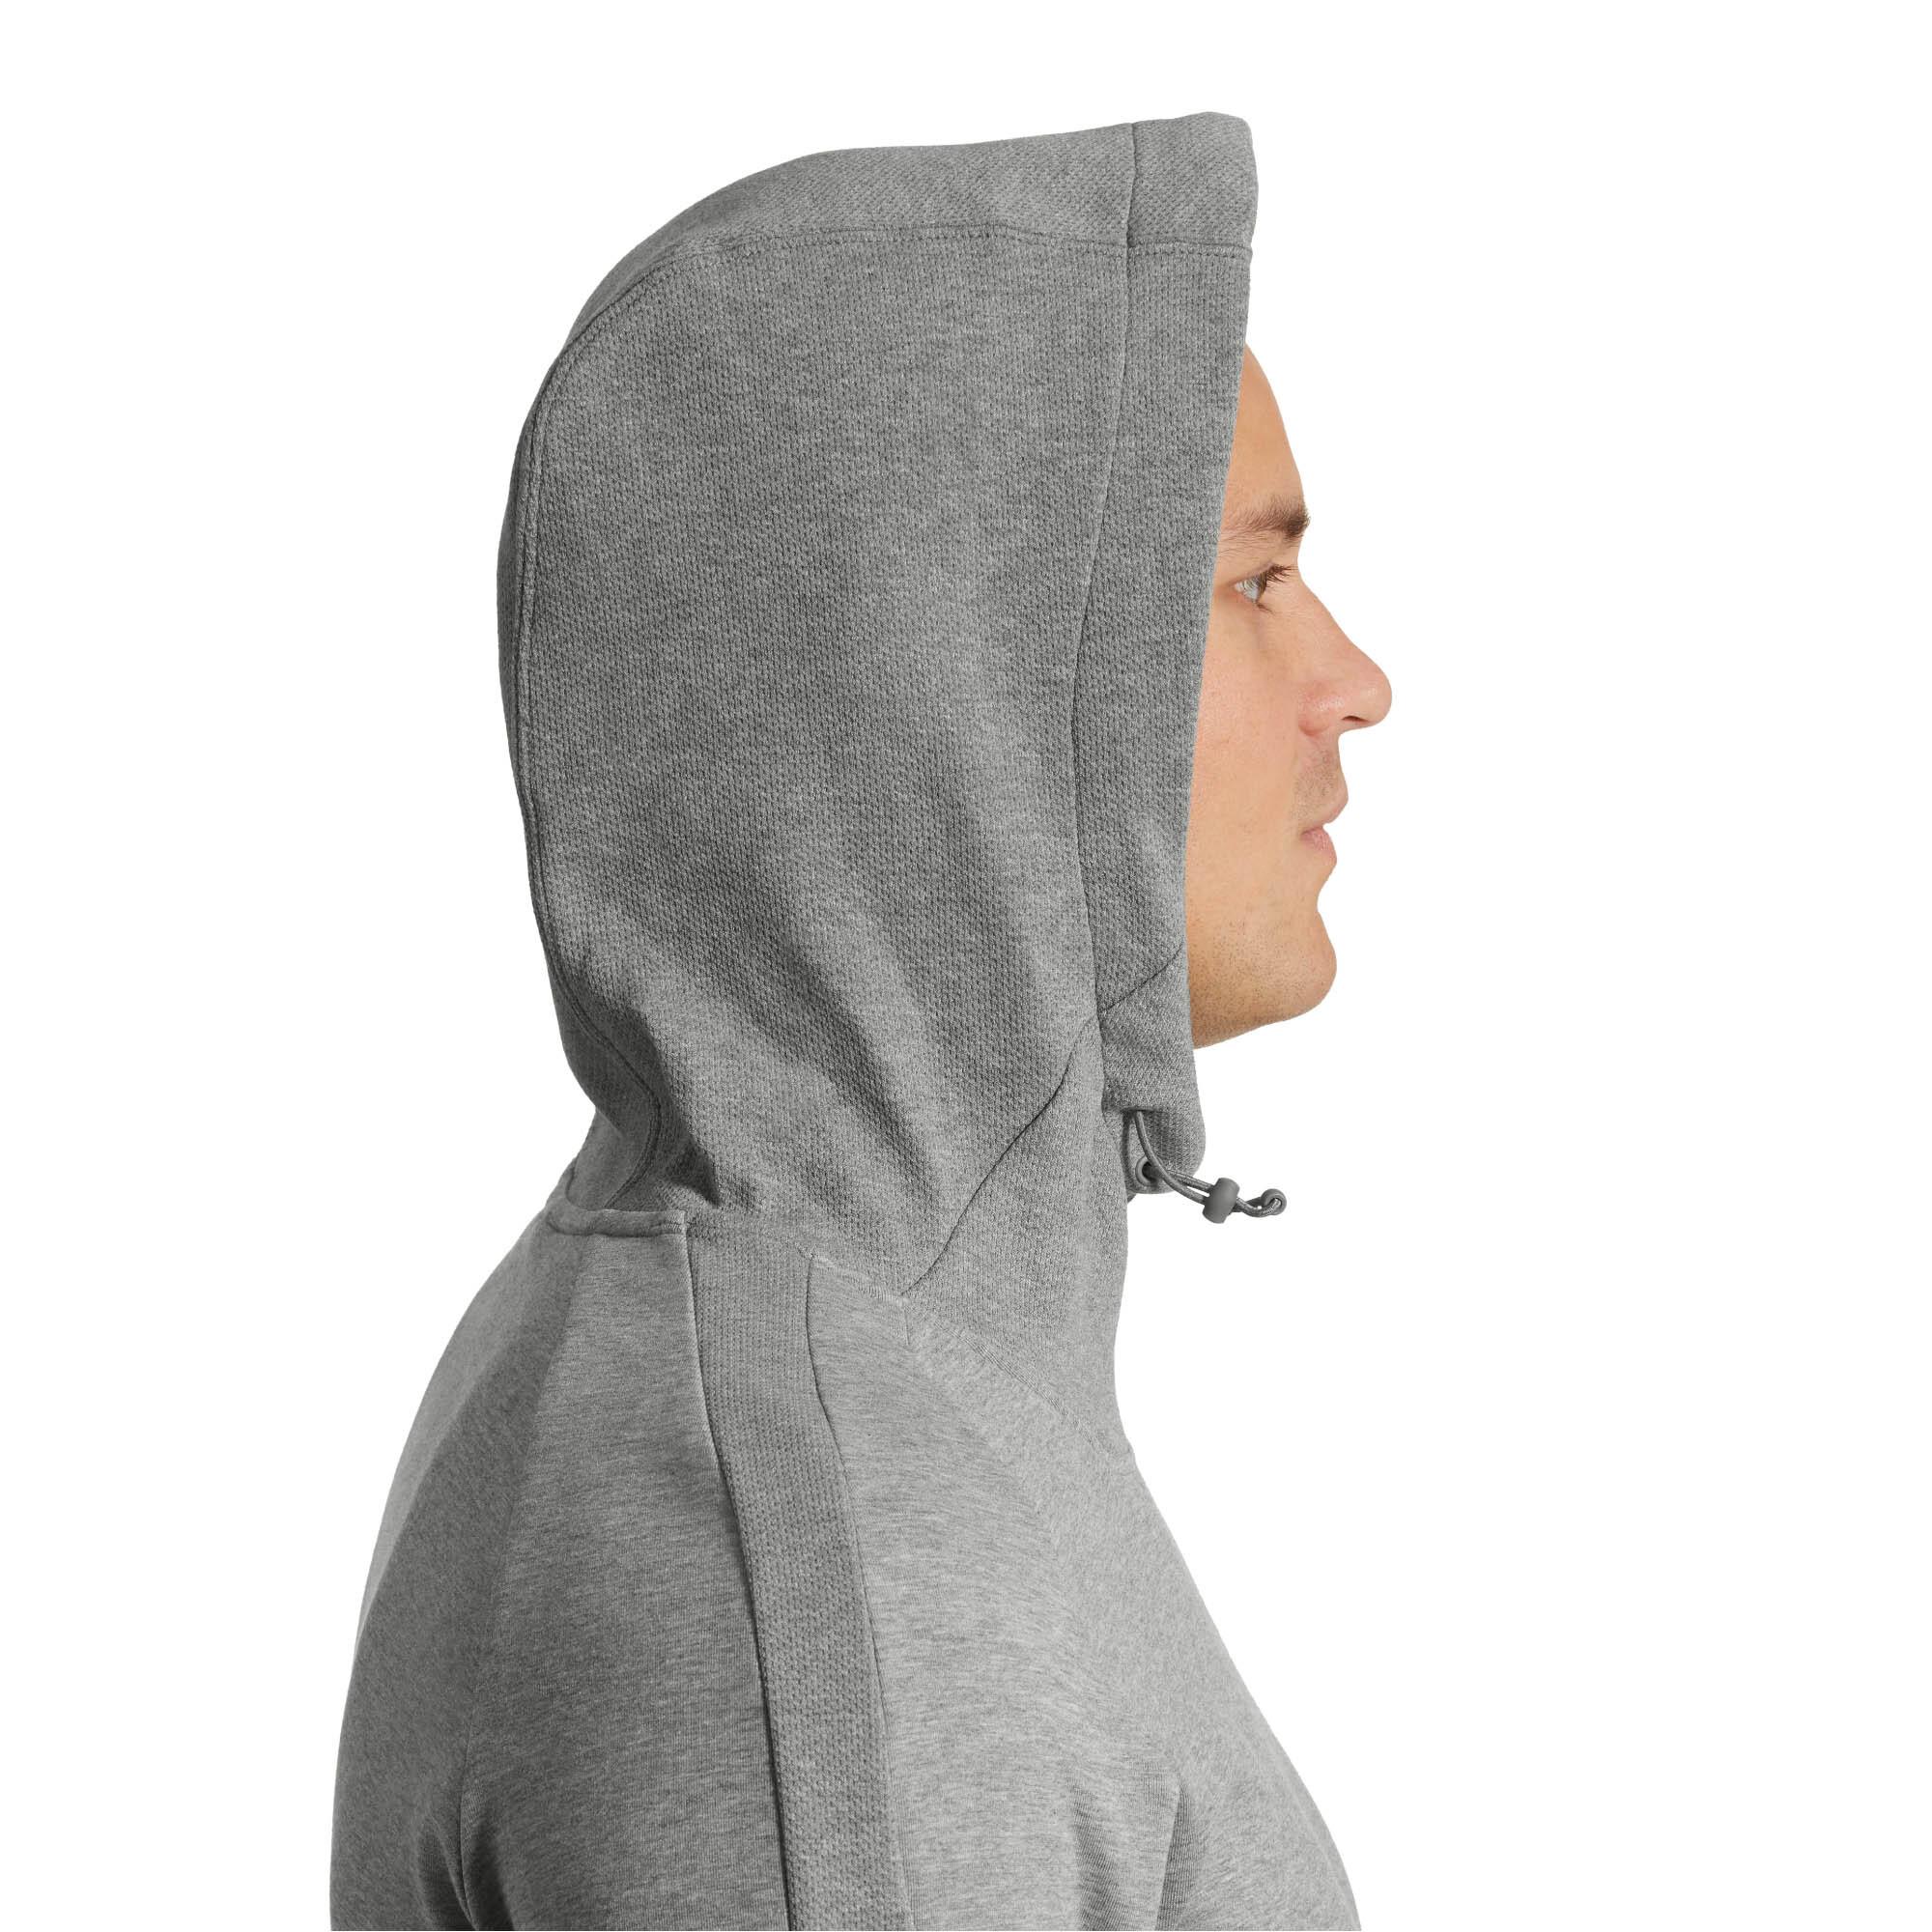 PUMA-Evostripe-Move-Men-039-s-Hoodie-Men-Sweat-Basics thumbnail 16